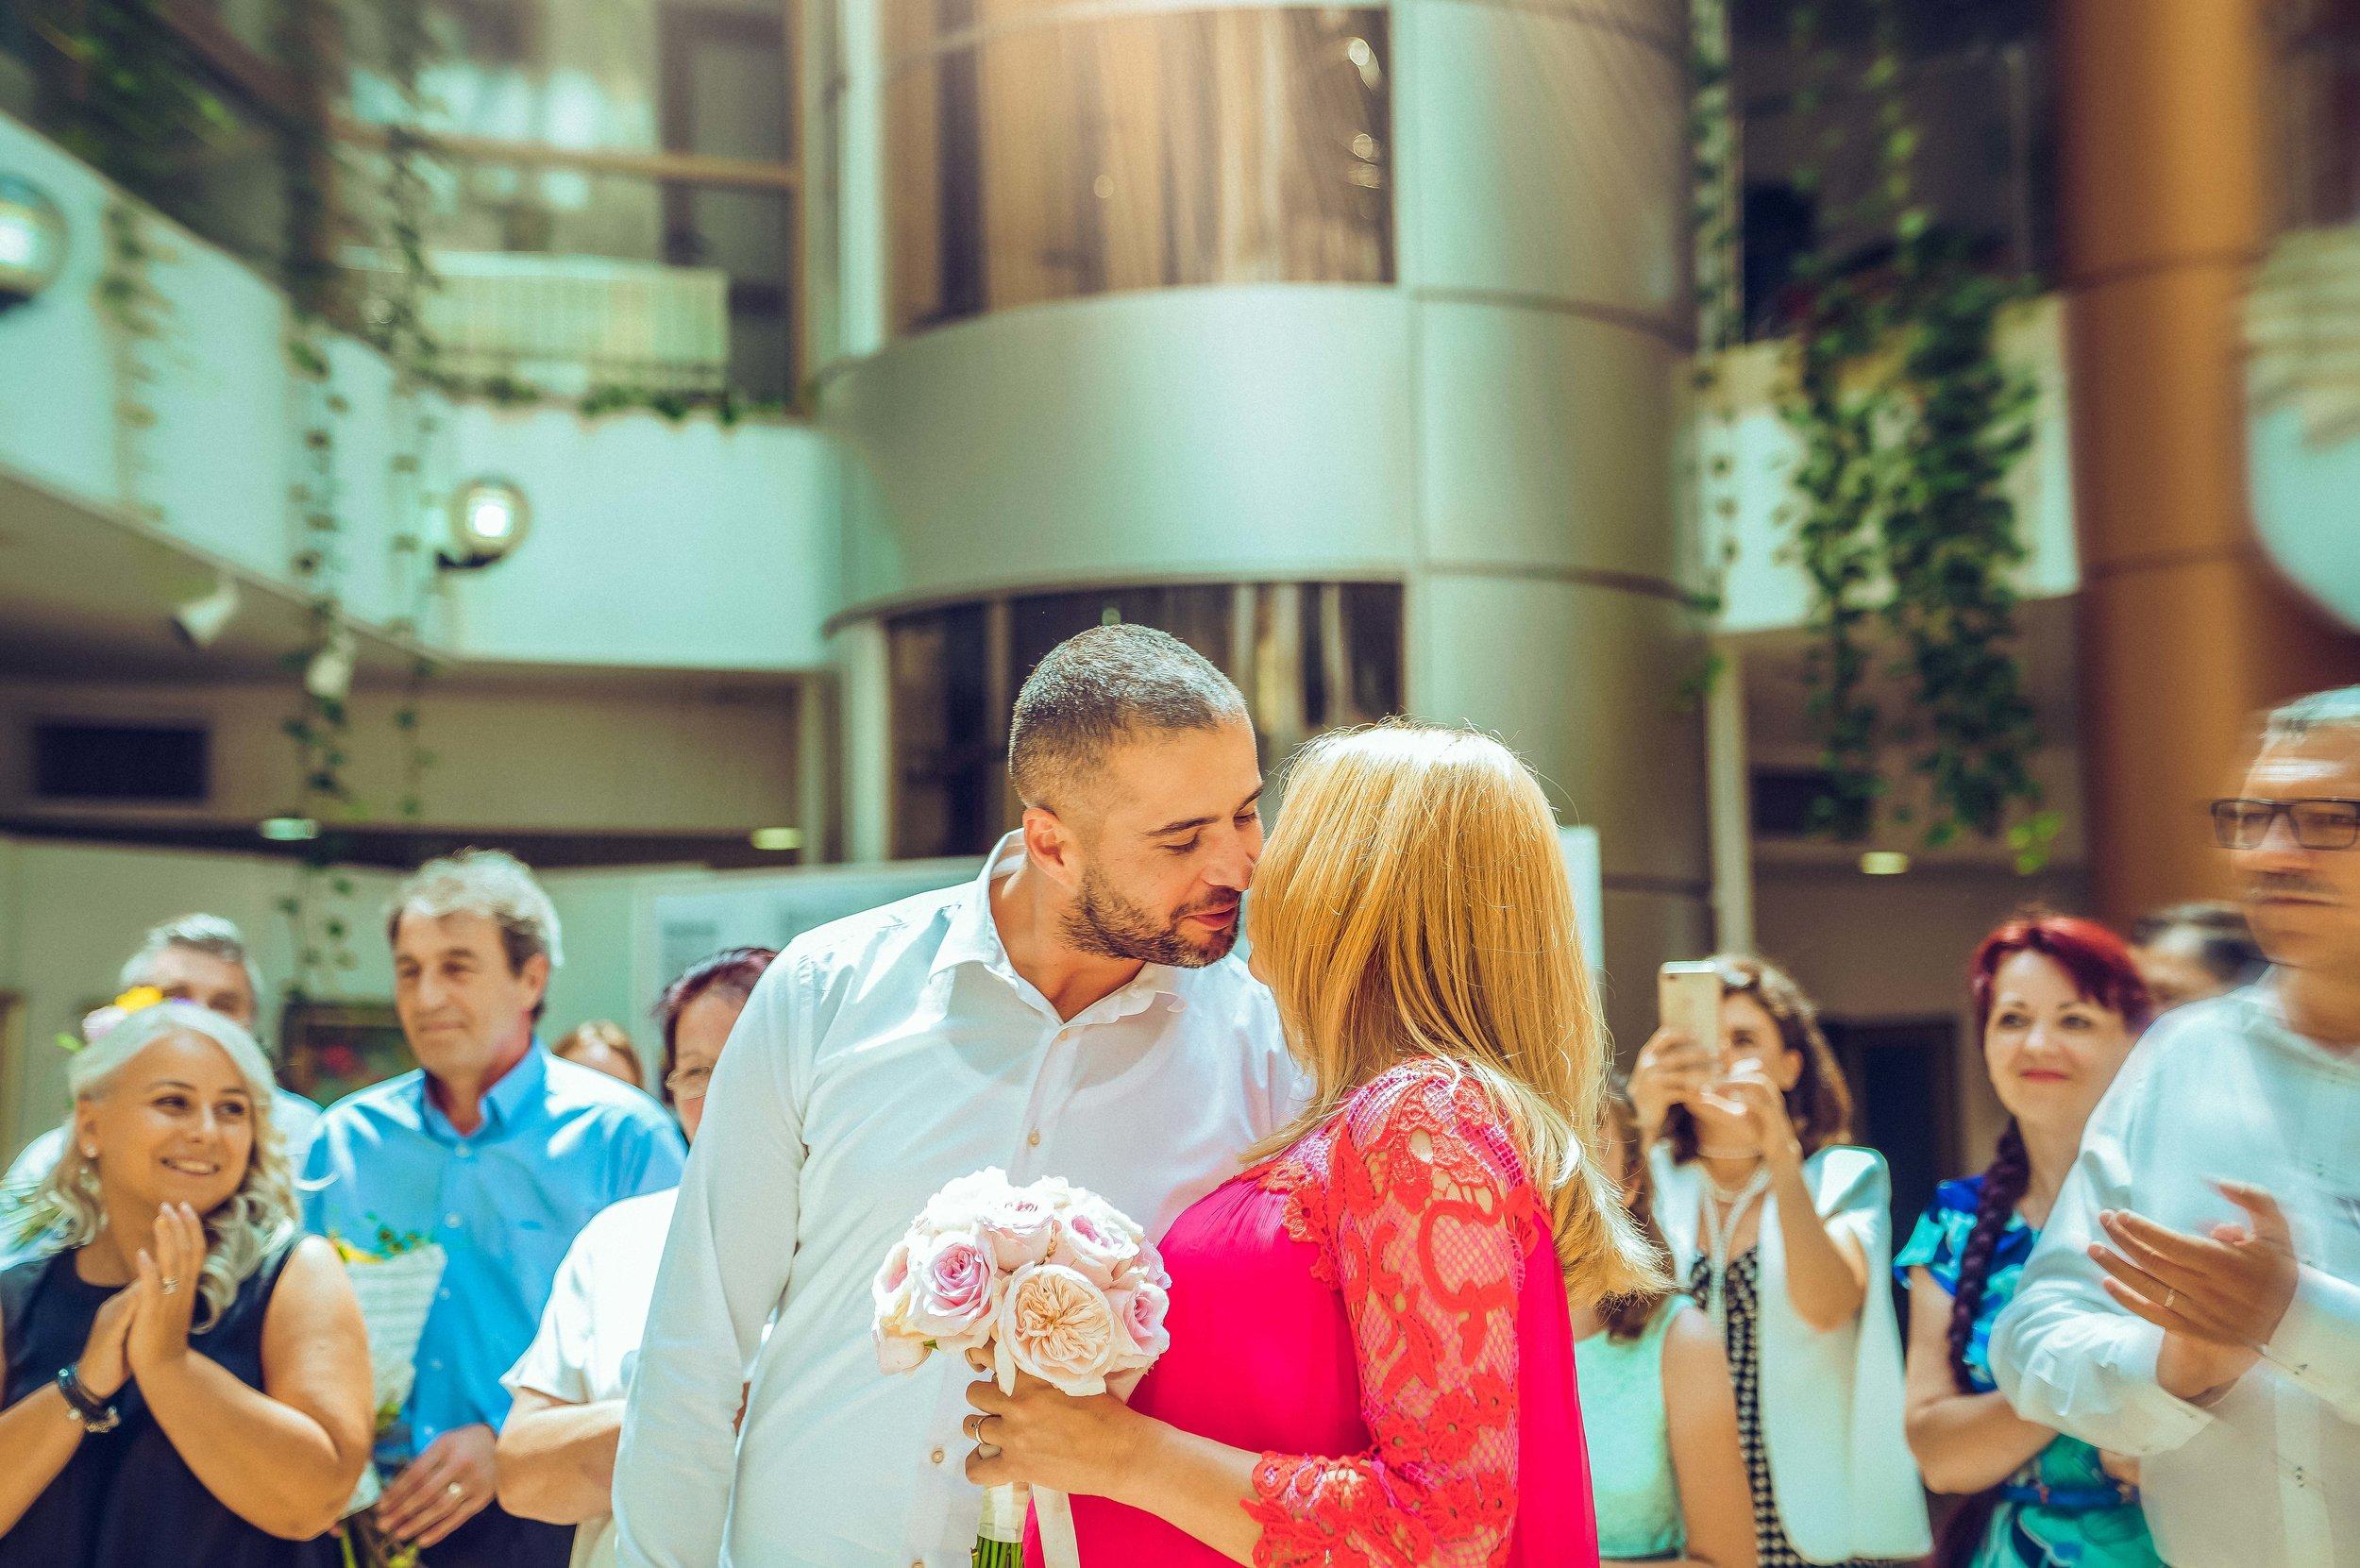 Diana & Cristi Wedding by Crina Popescu-11.jpg